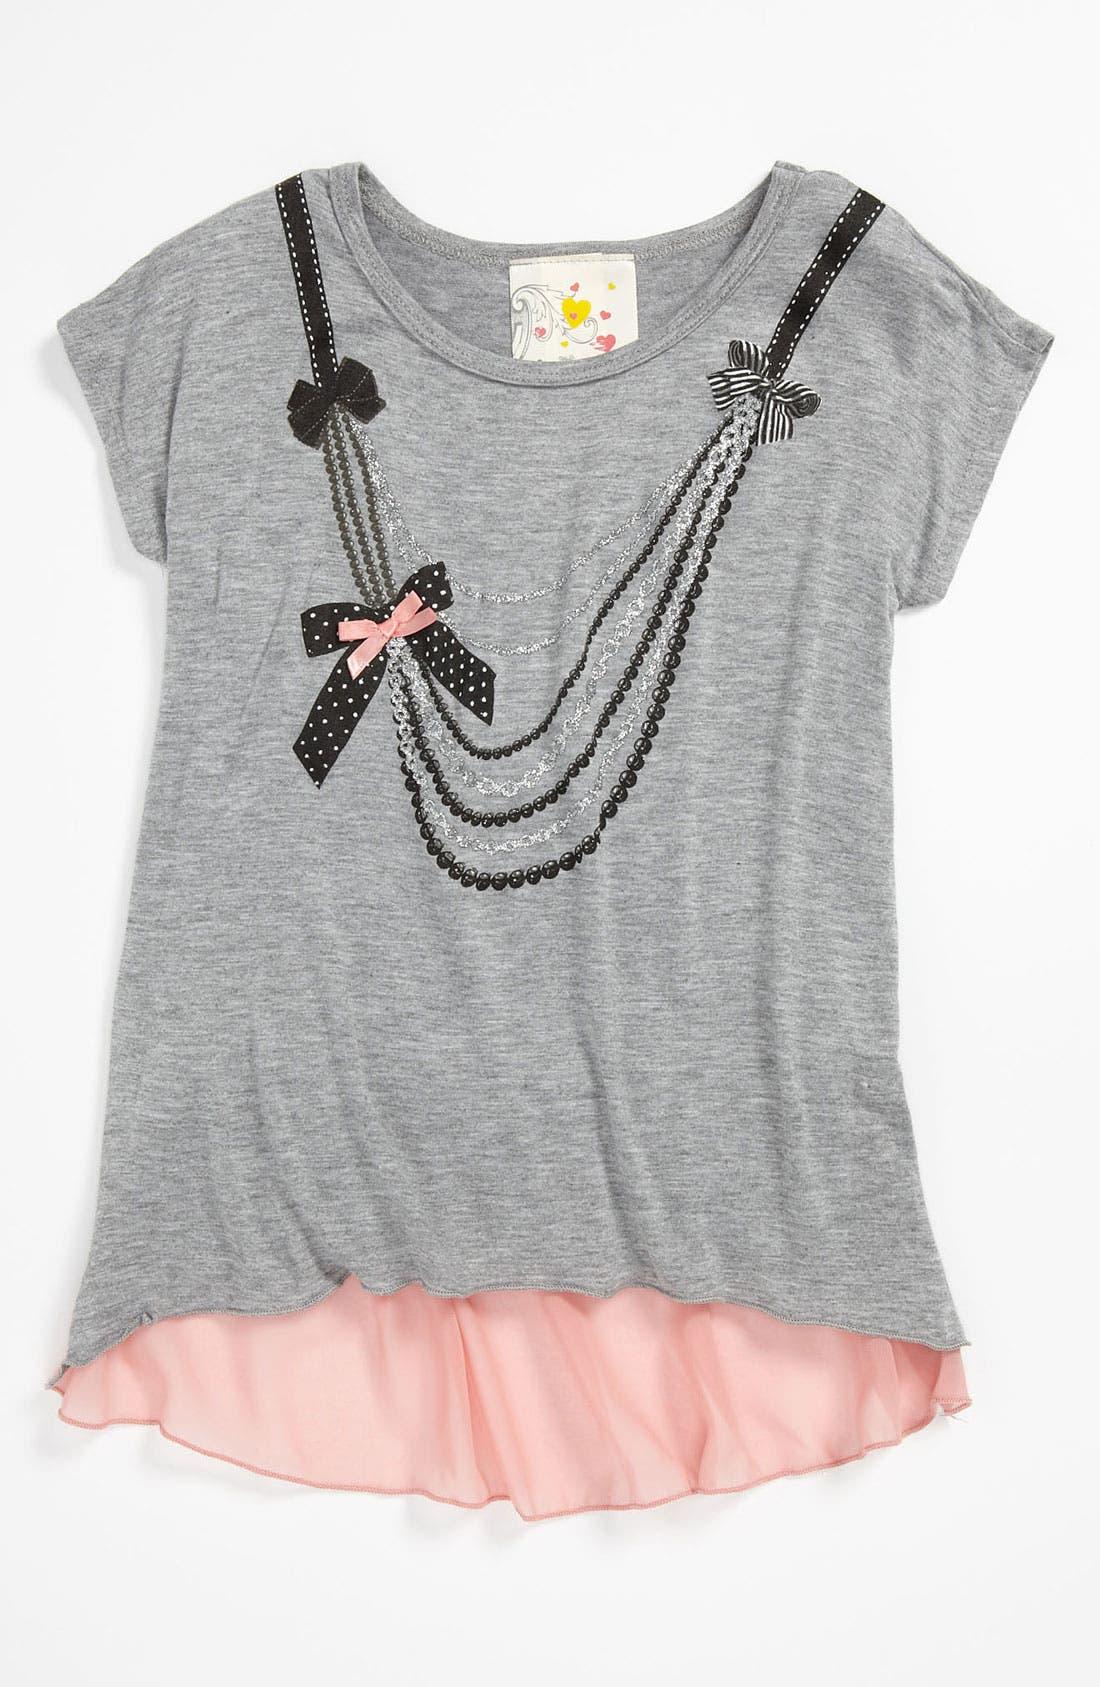 Main Image - Jenna & Jessie 'Necklace' Tee (Little Girls)